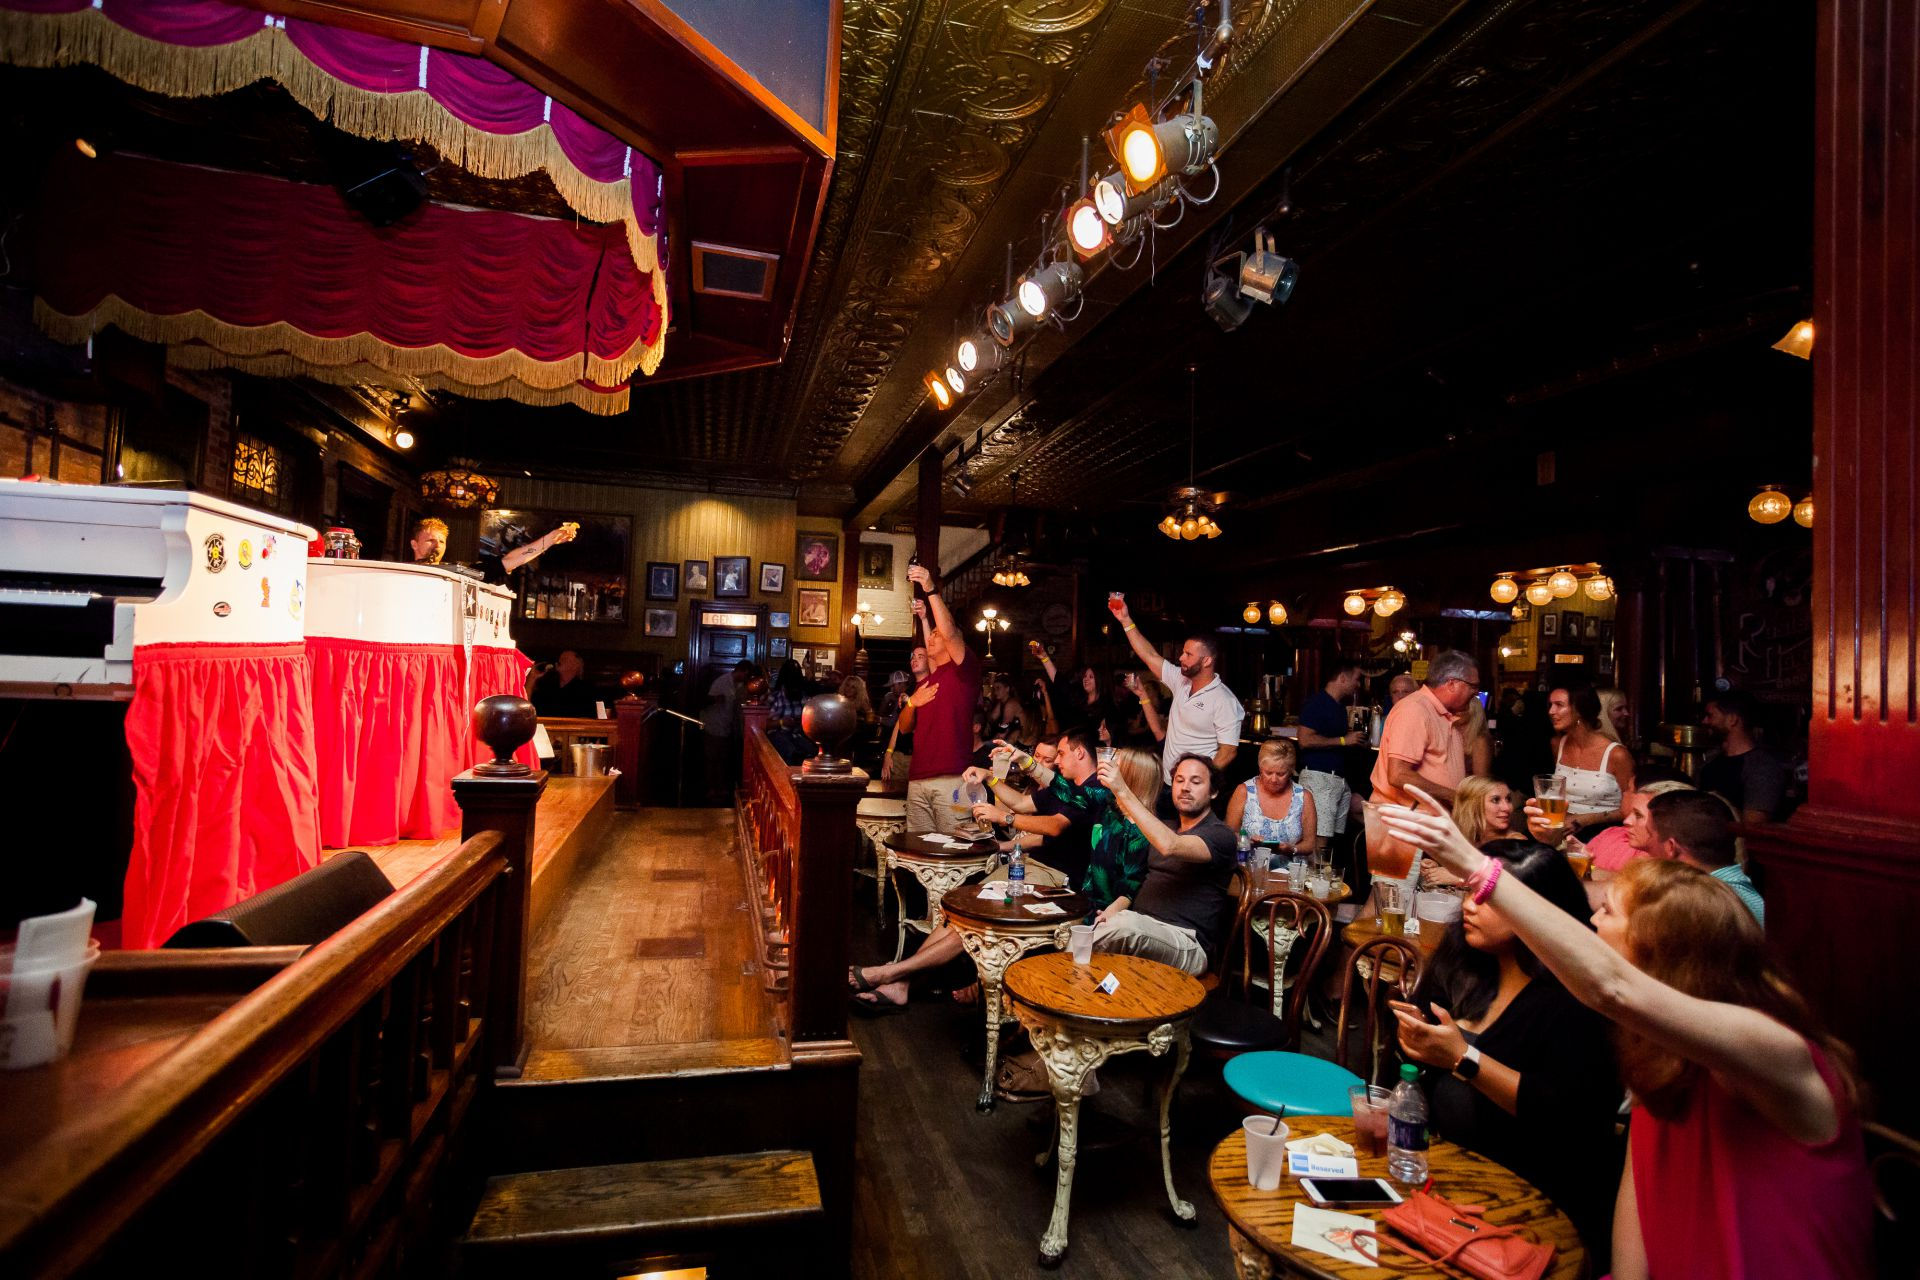 Piano Show at Rosie O'Grady's Bar